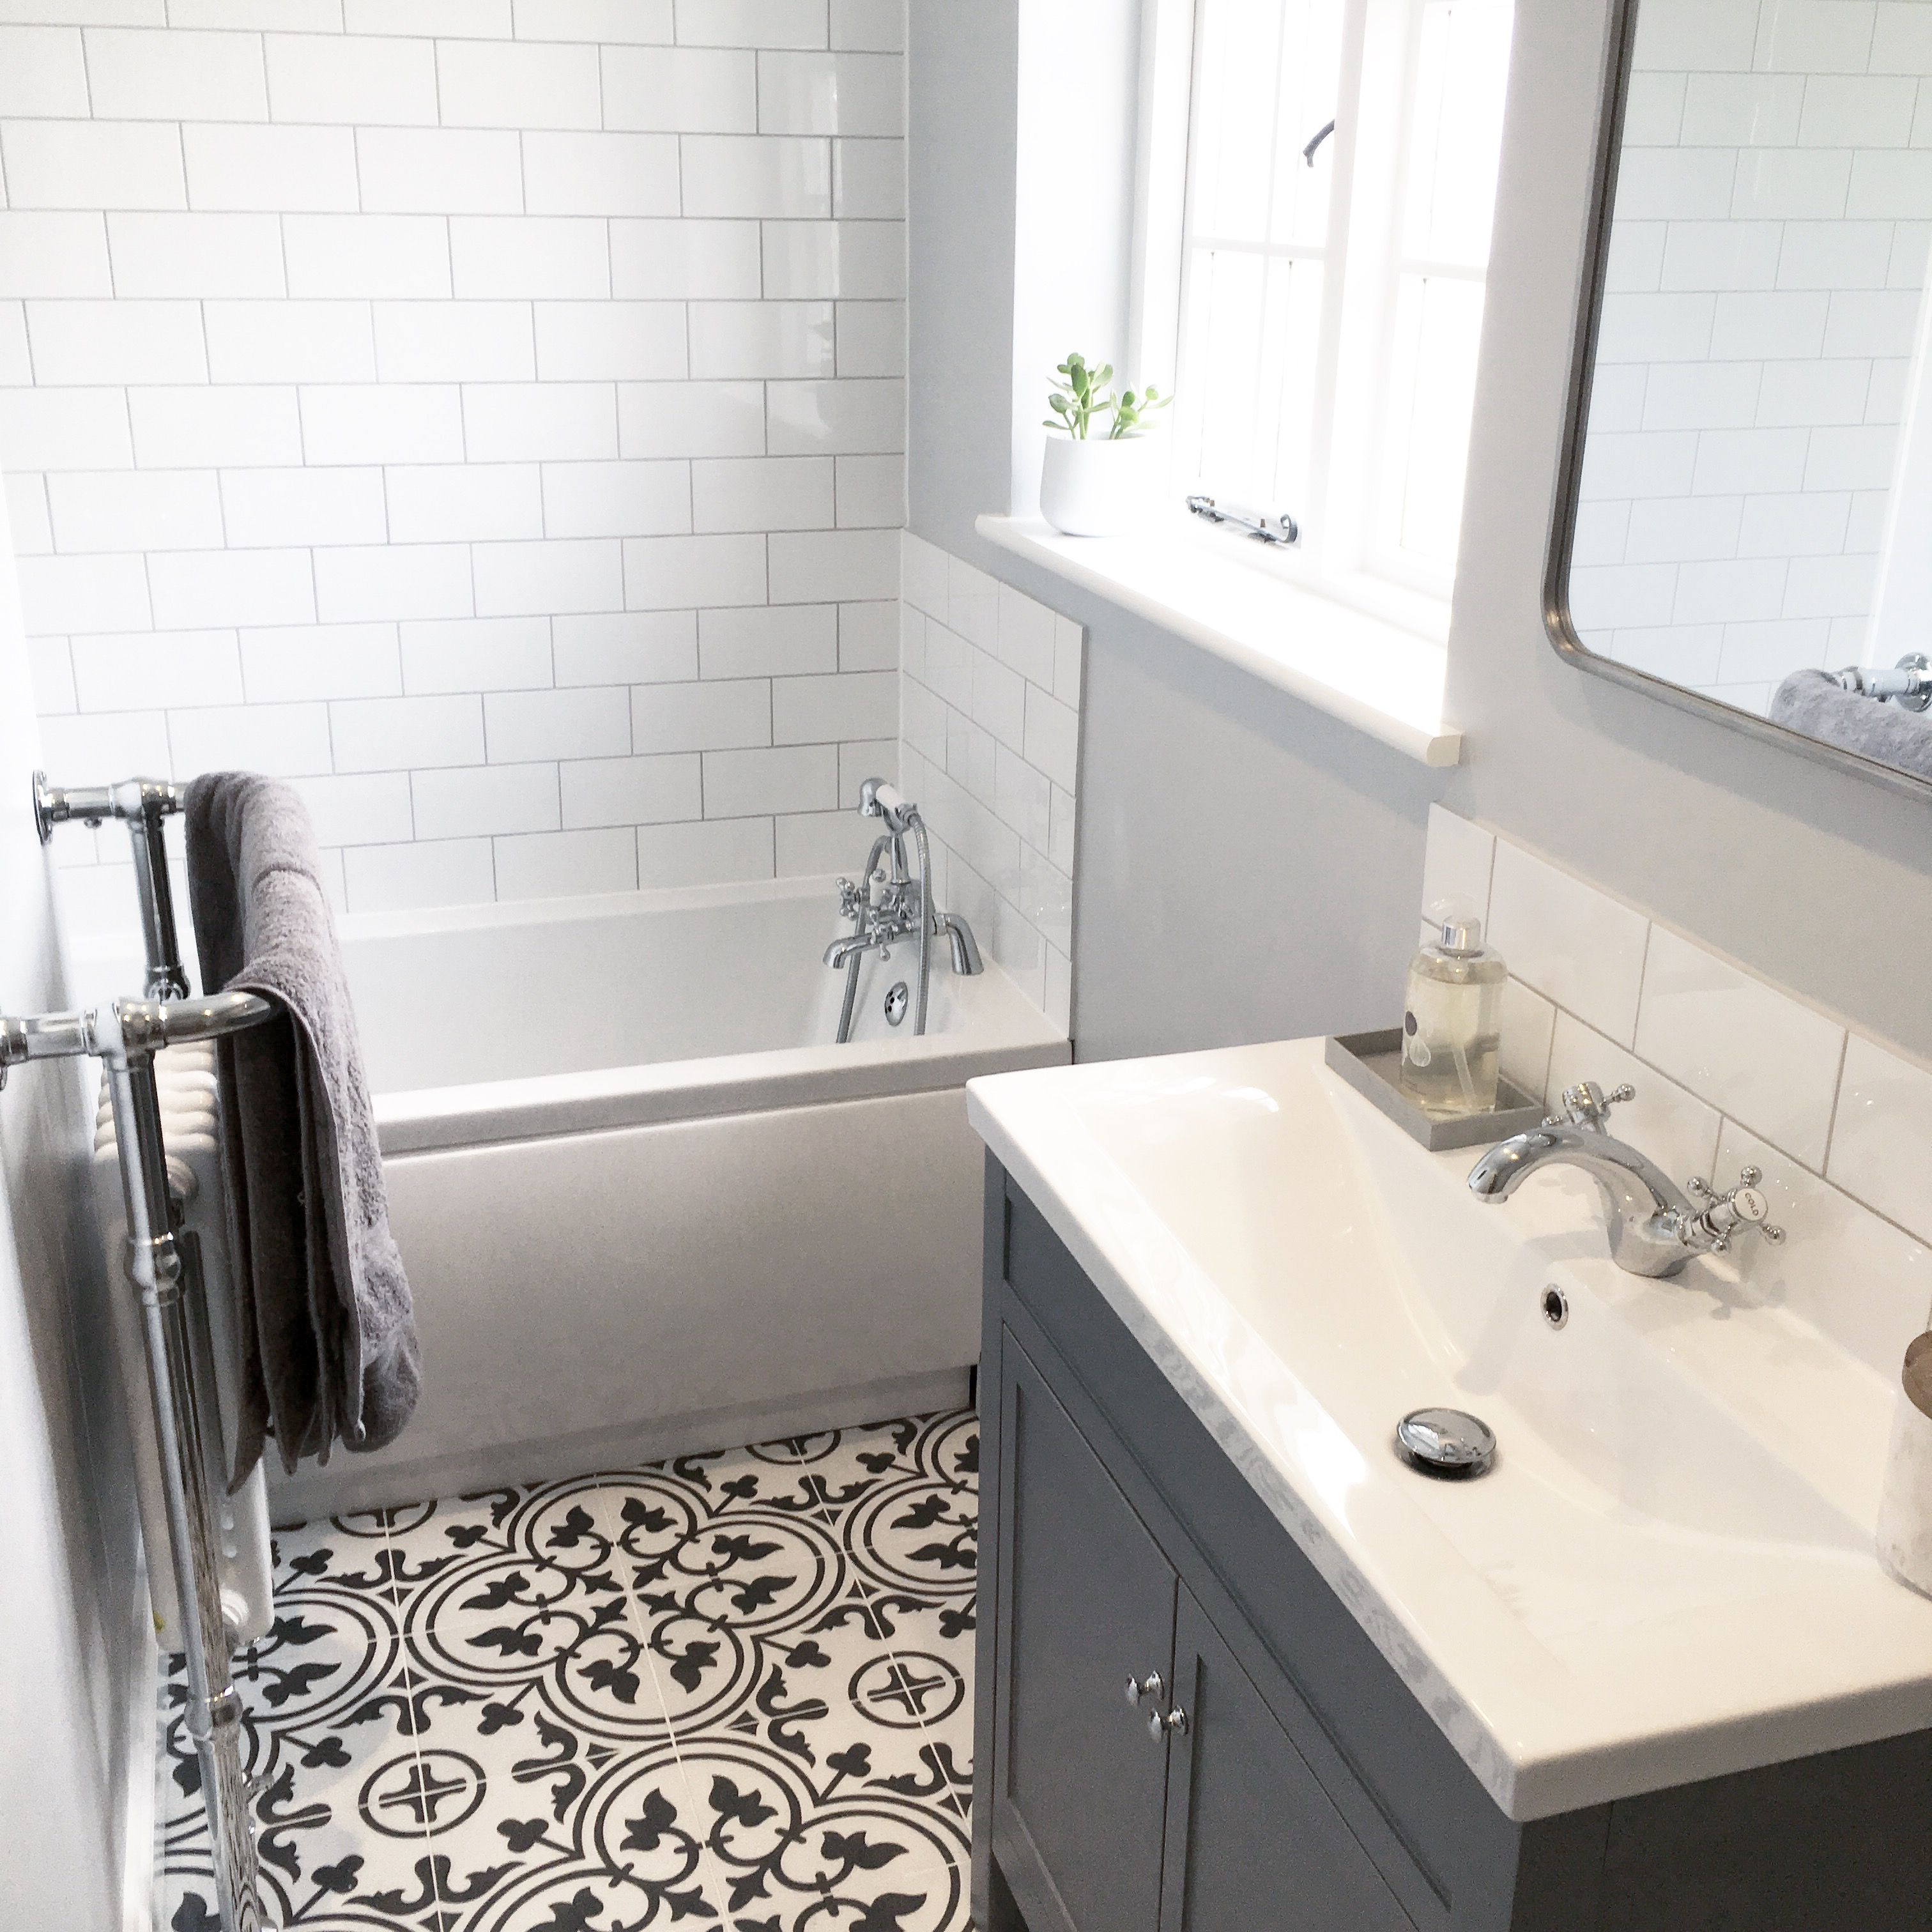 Grey Bathroom White Metro Tiles With Black And White Floor Tiles